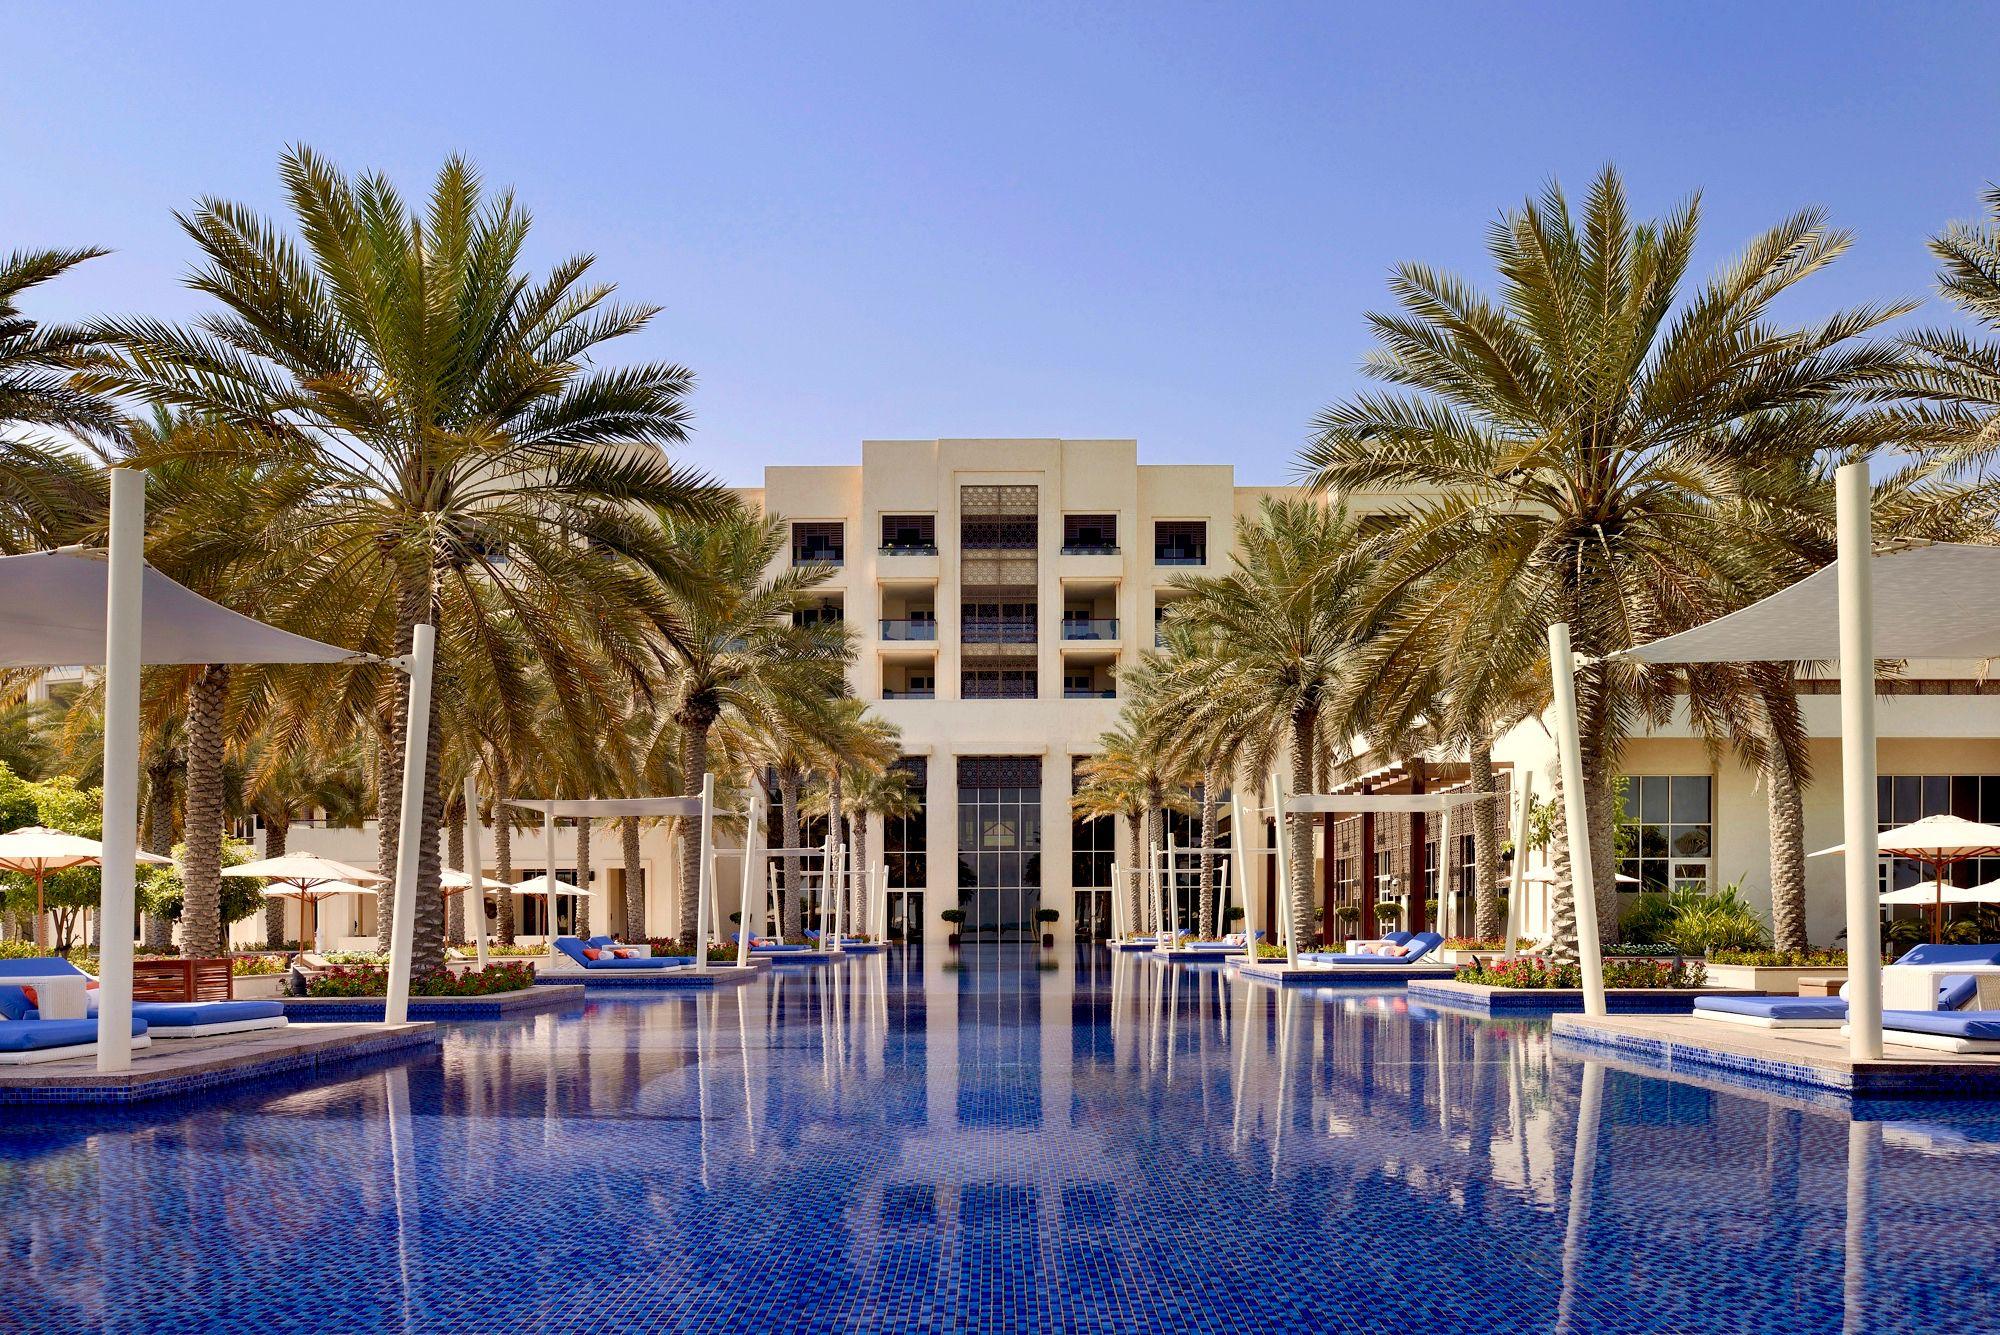 Pool at the entrance of the Park Hyatt Abu Dhabi luxury hotel